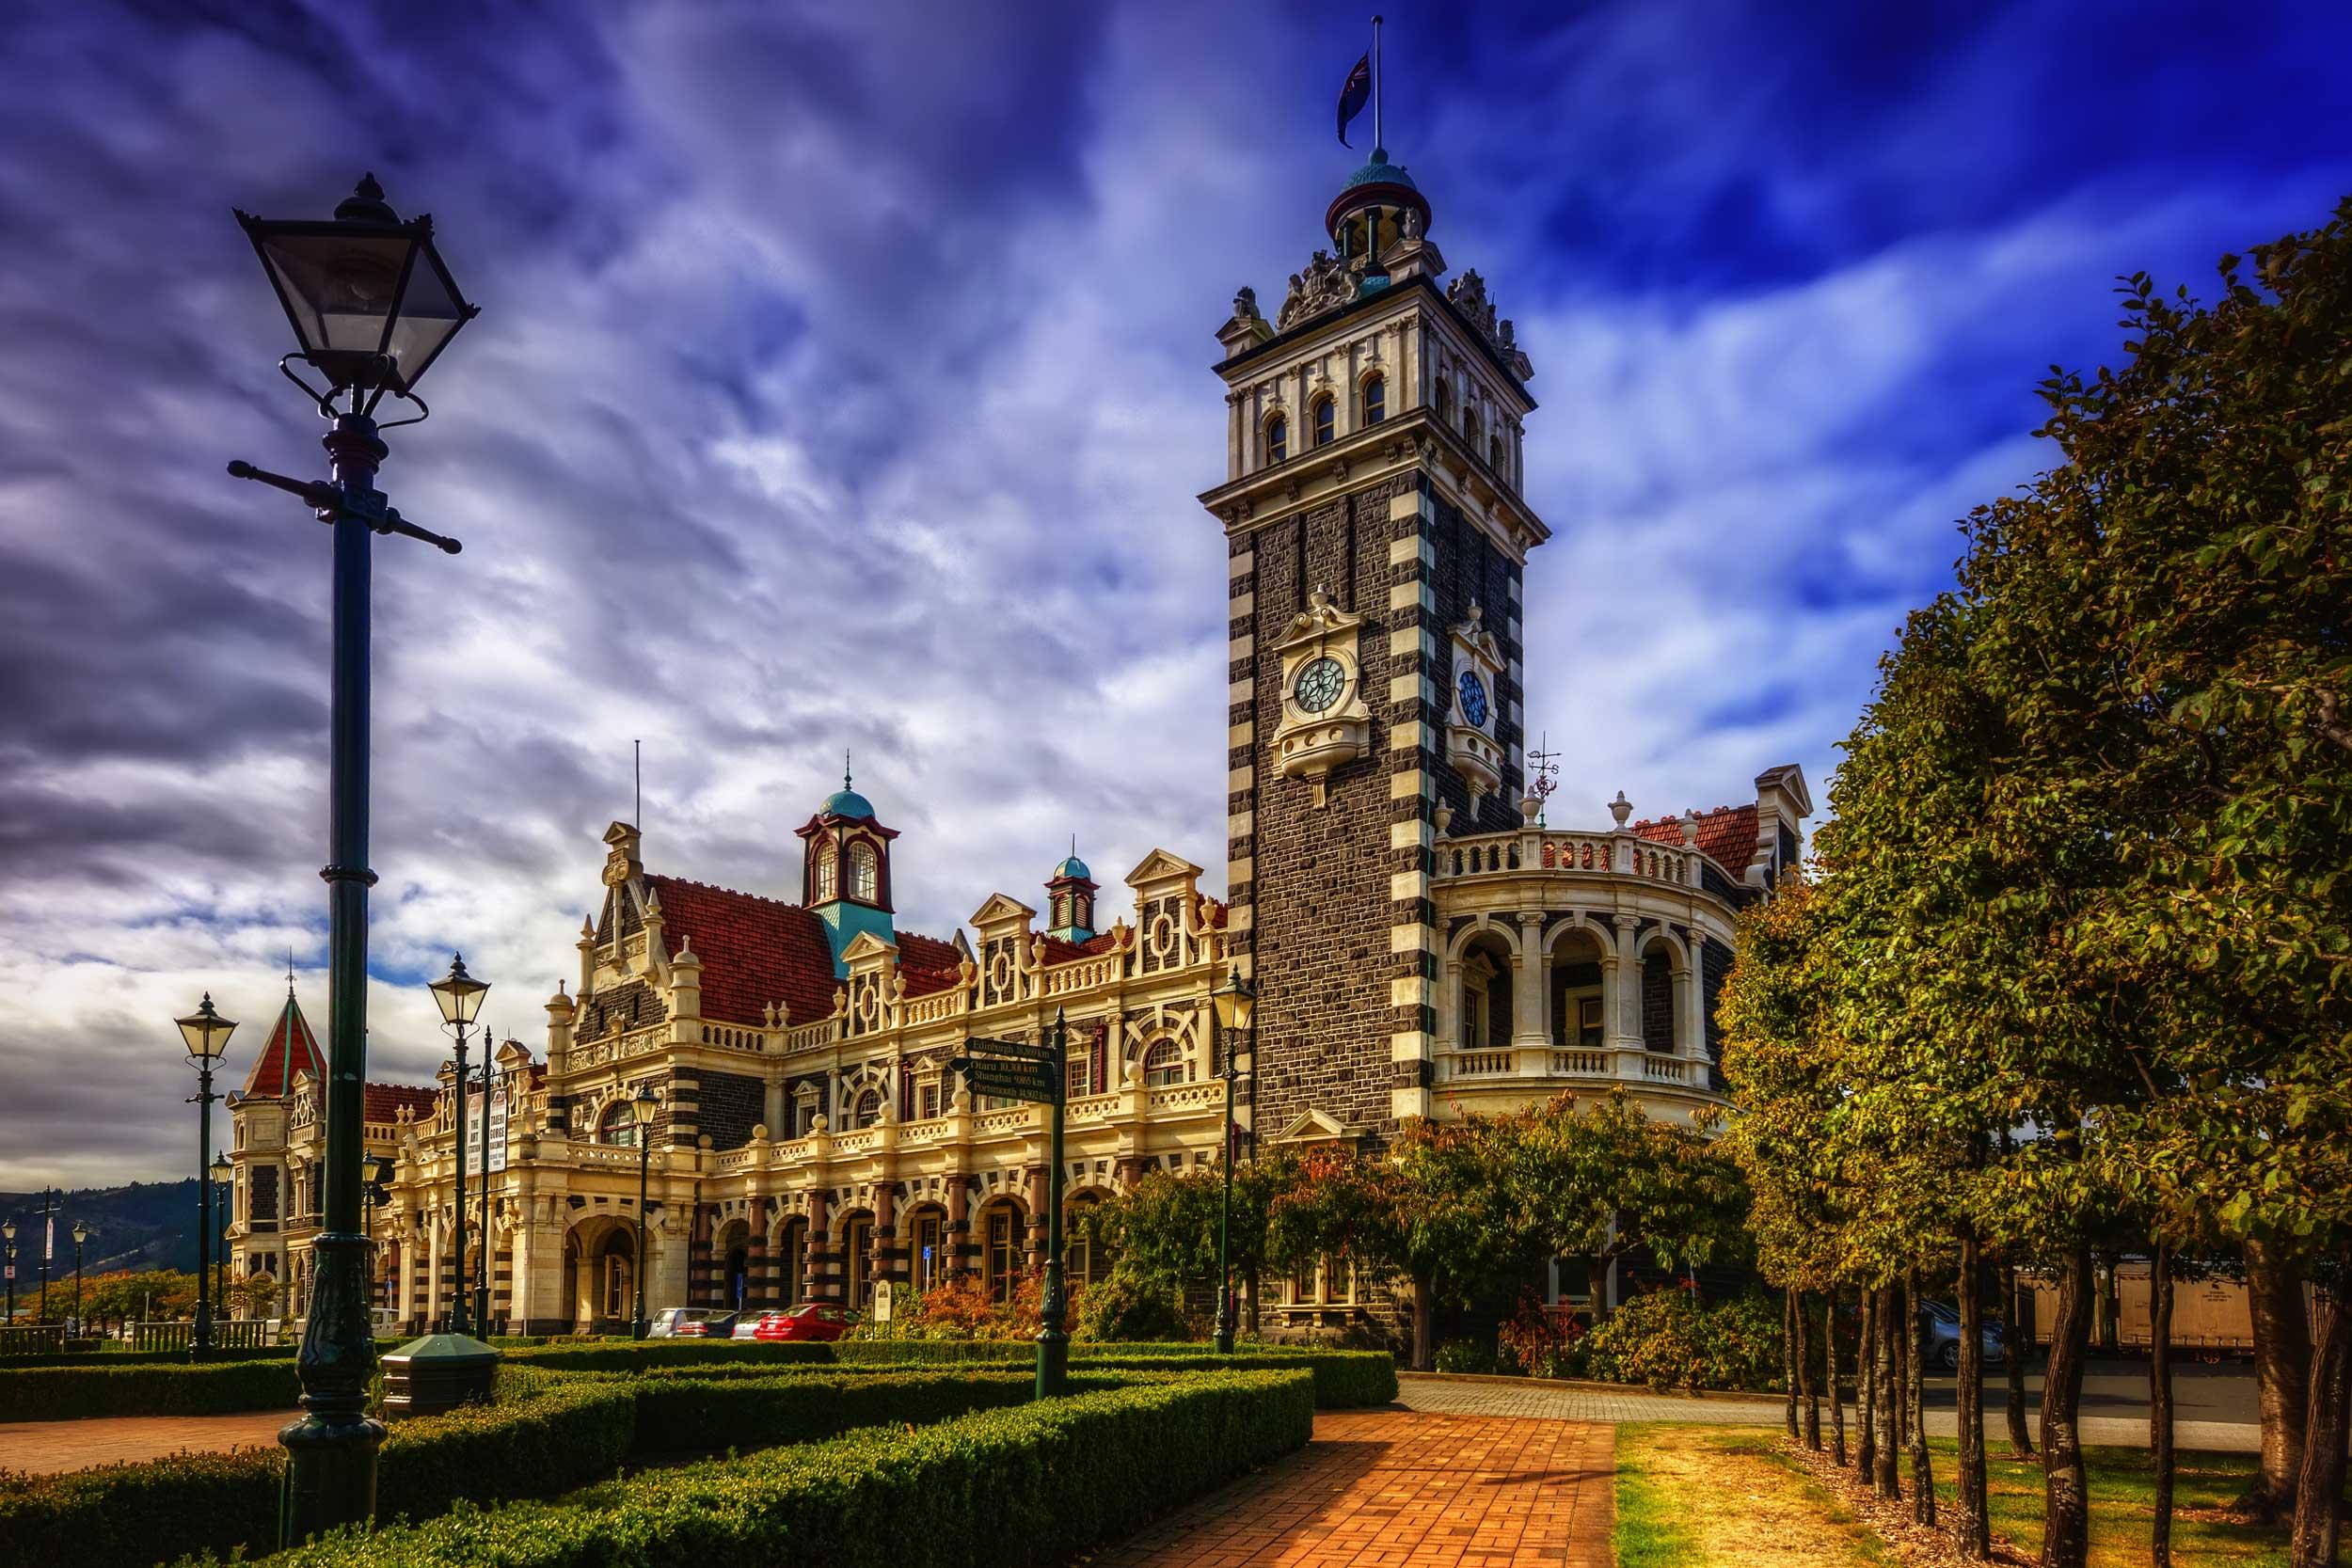 Old Flemish renaissance style building, Dunedin